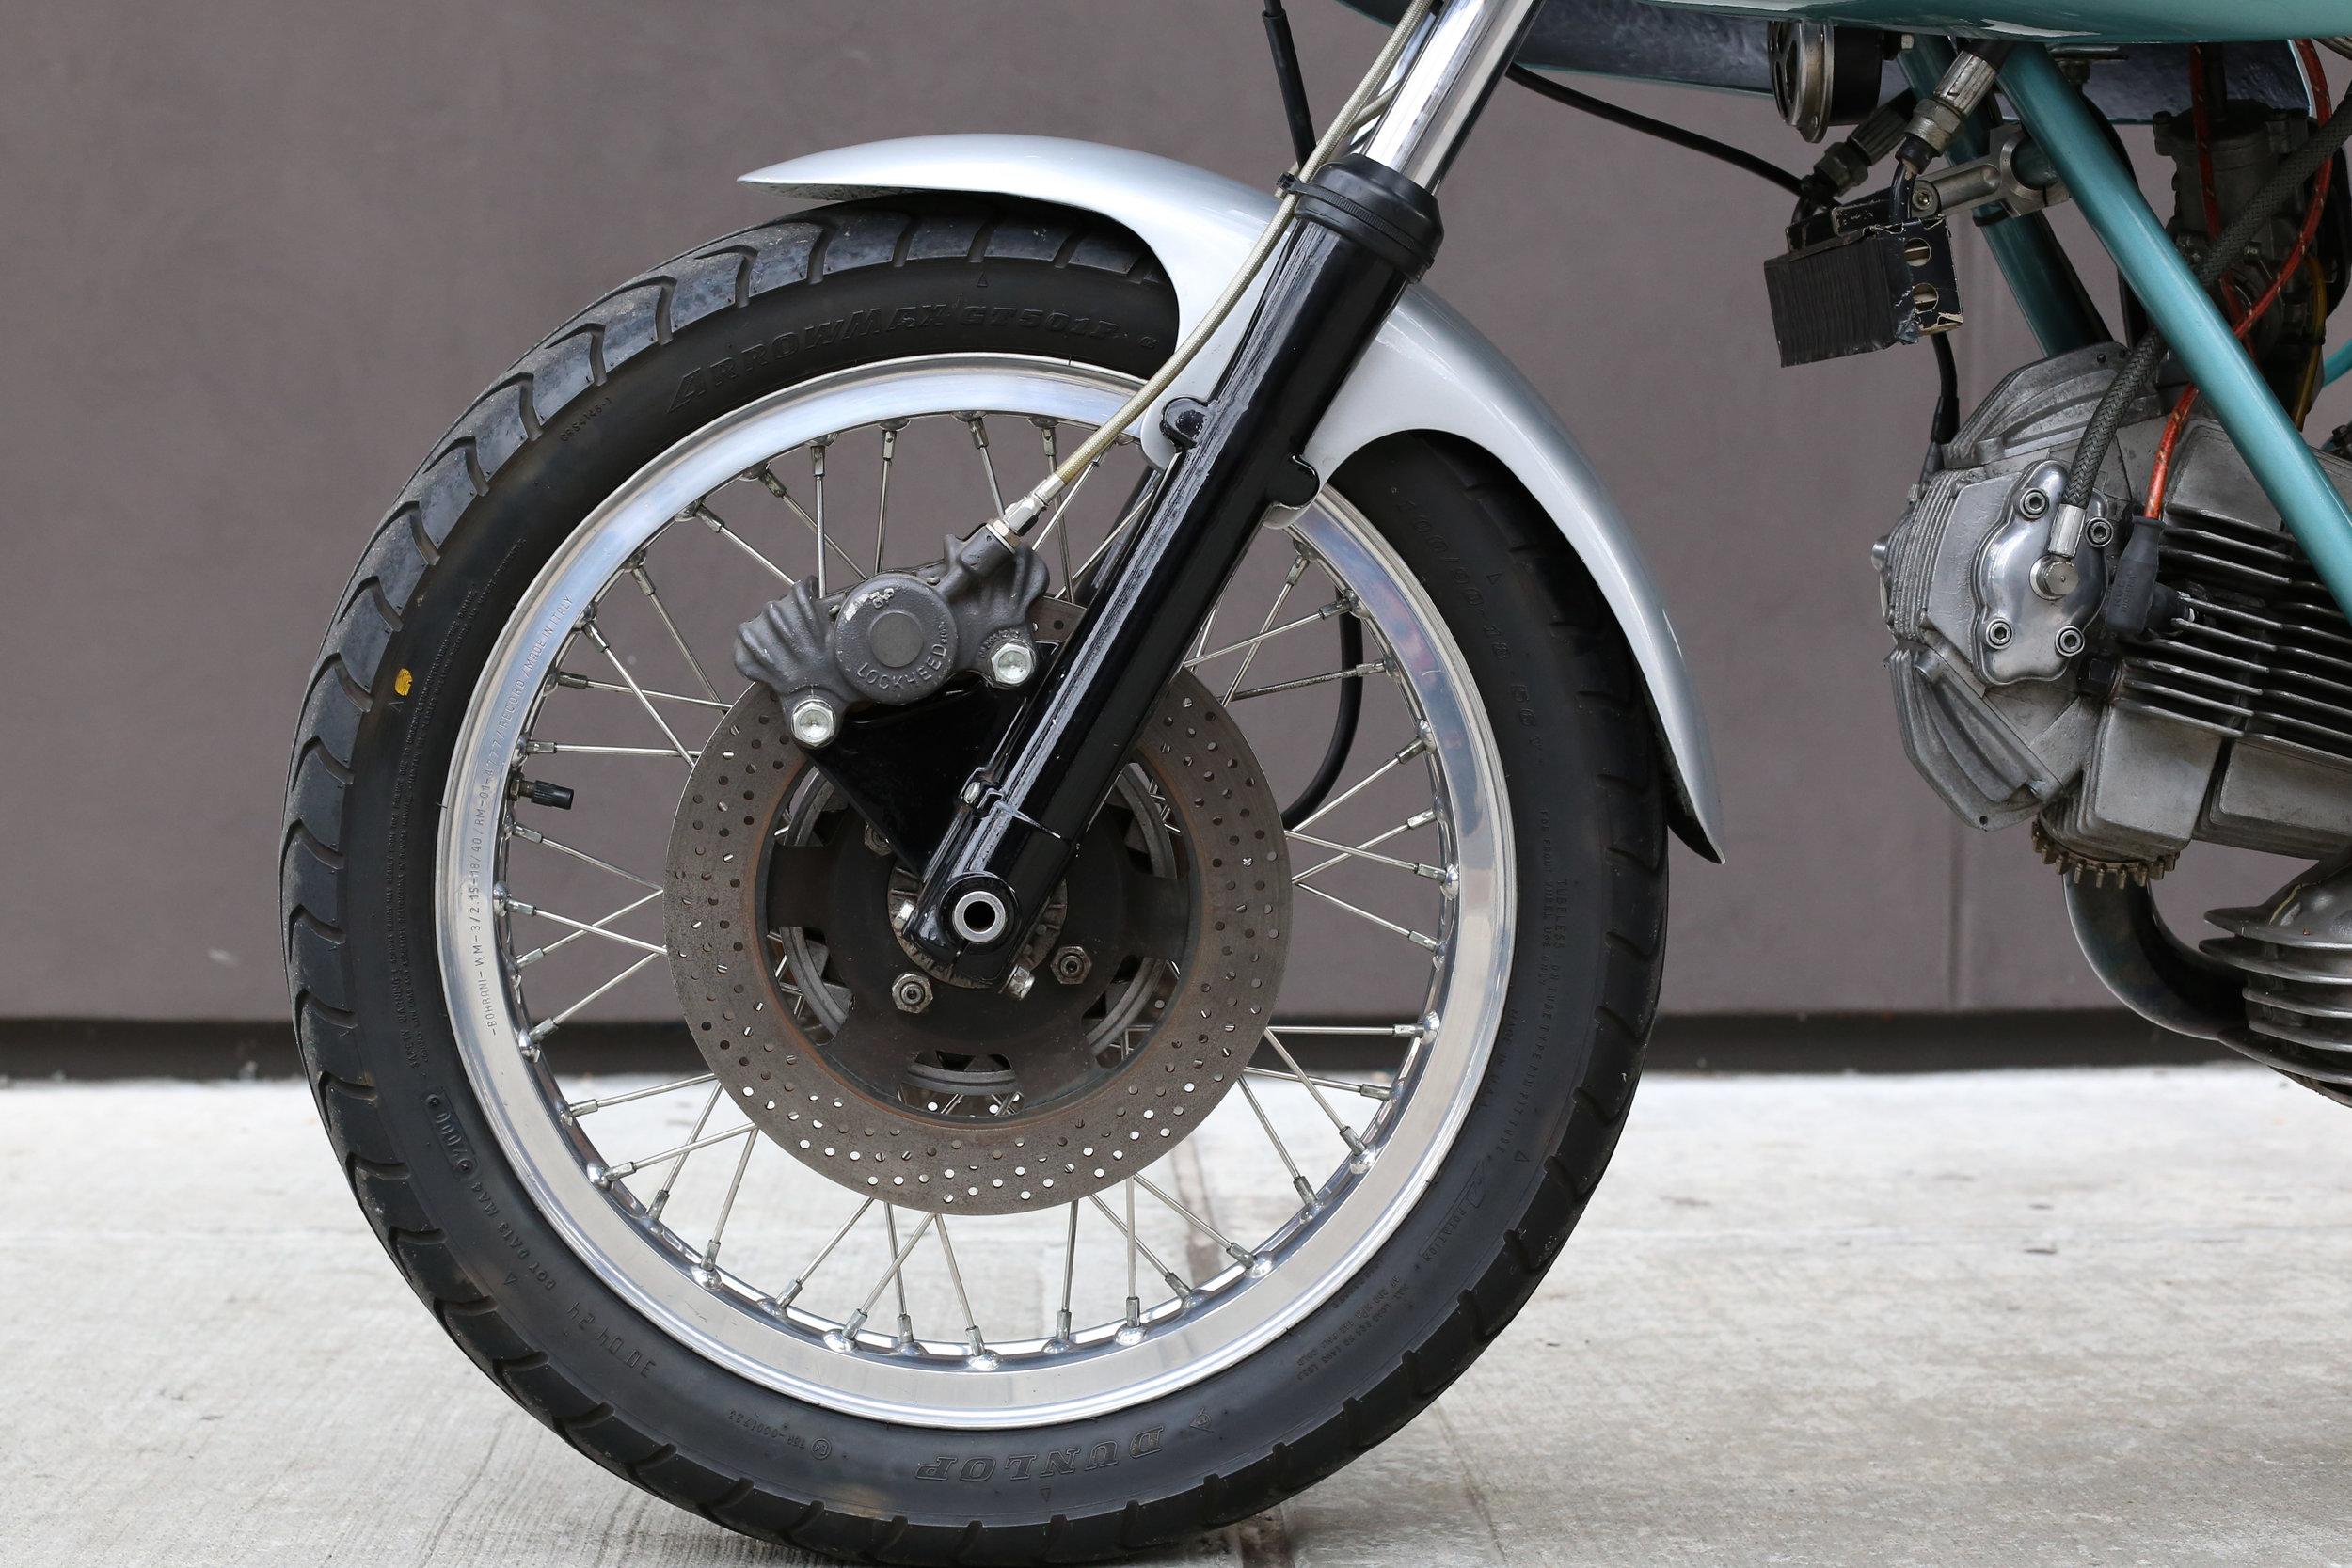 1974 Ducati 750SS green frame moto borgotaro front wheel disc brake